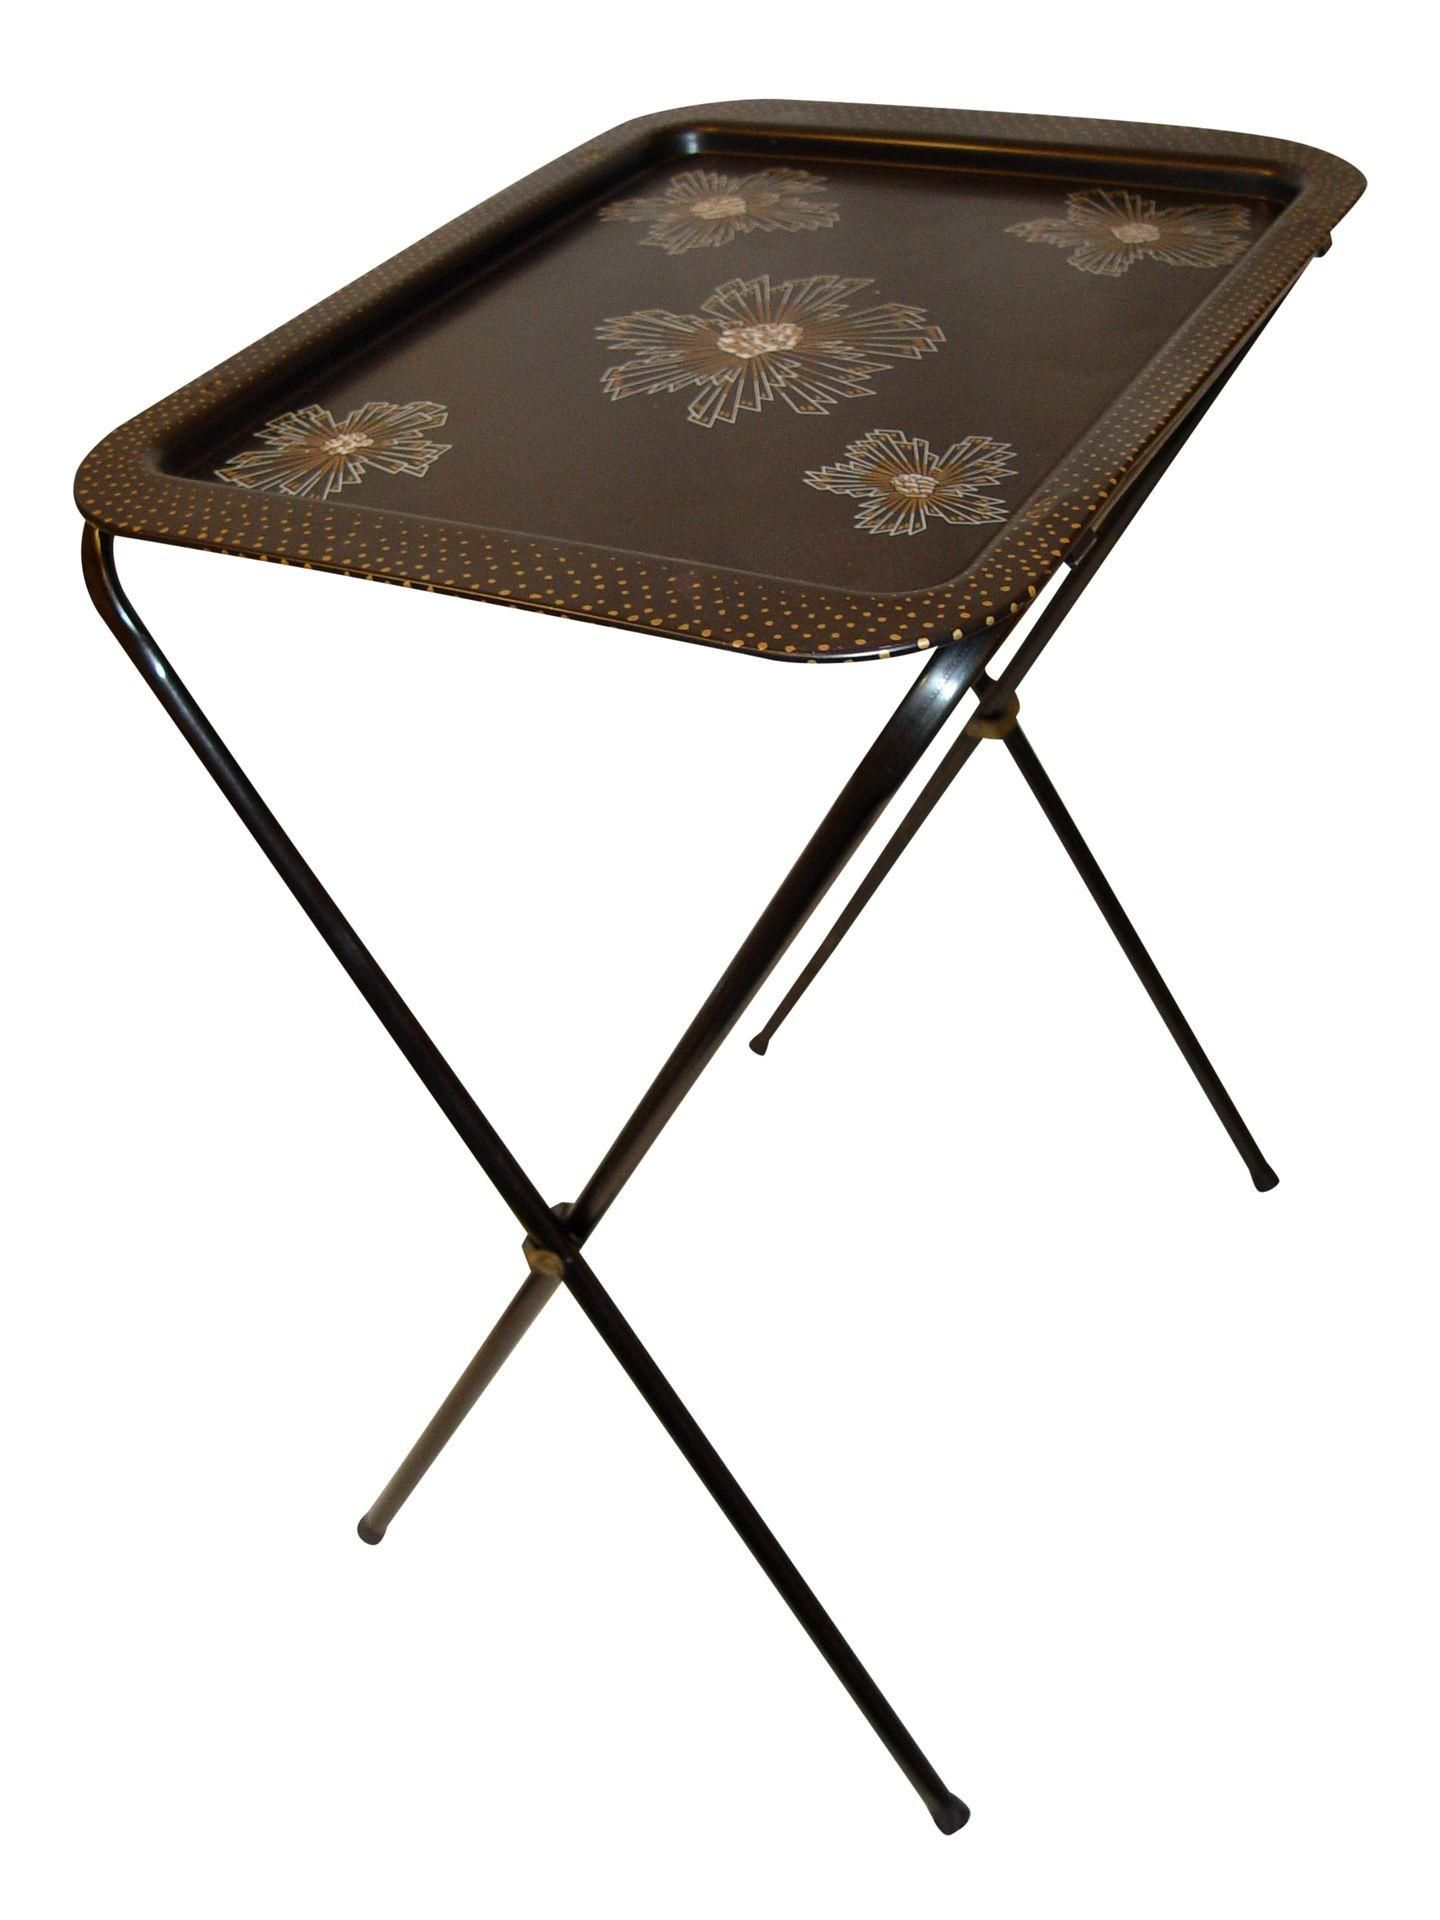 metal folding tv tray table black white & gold